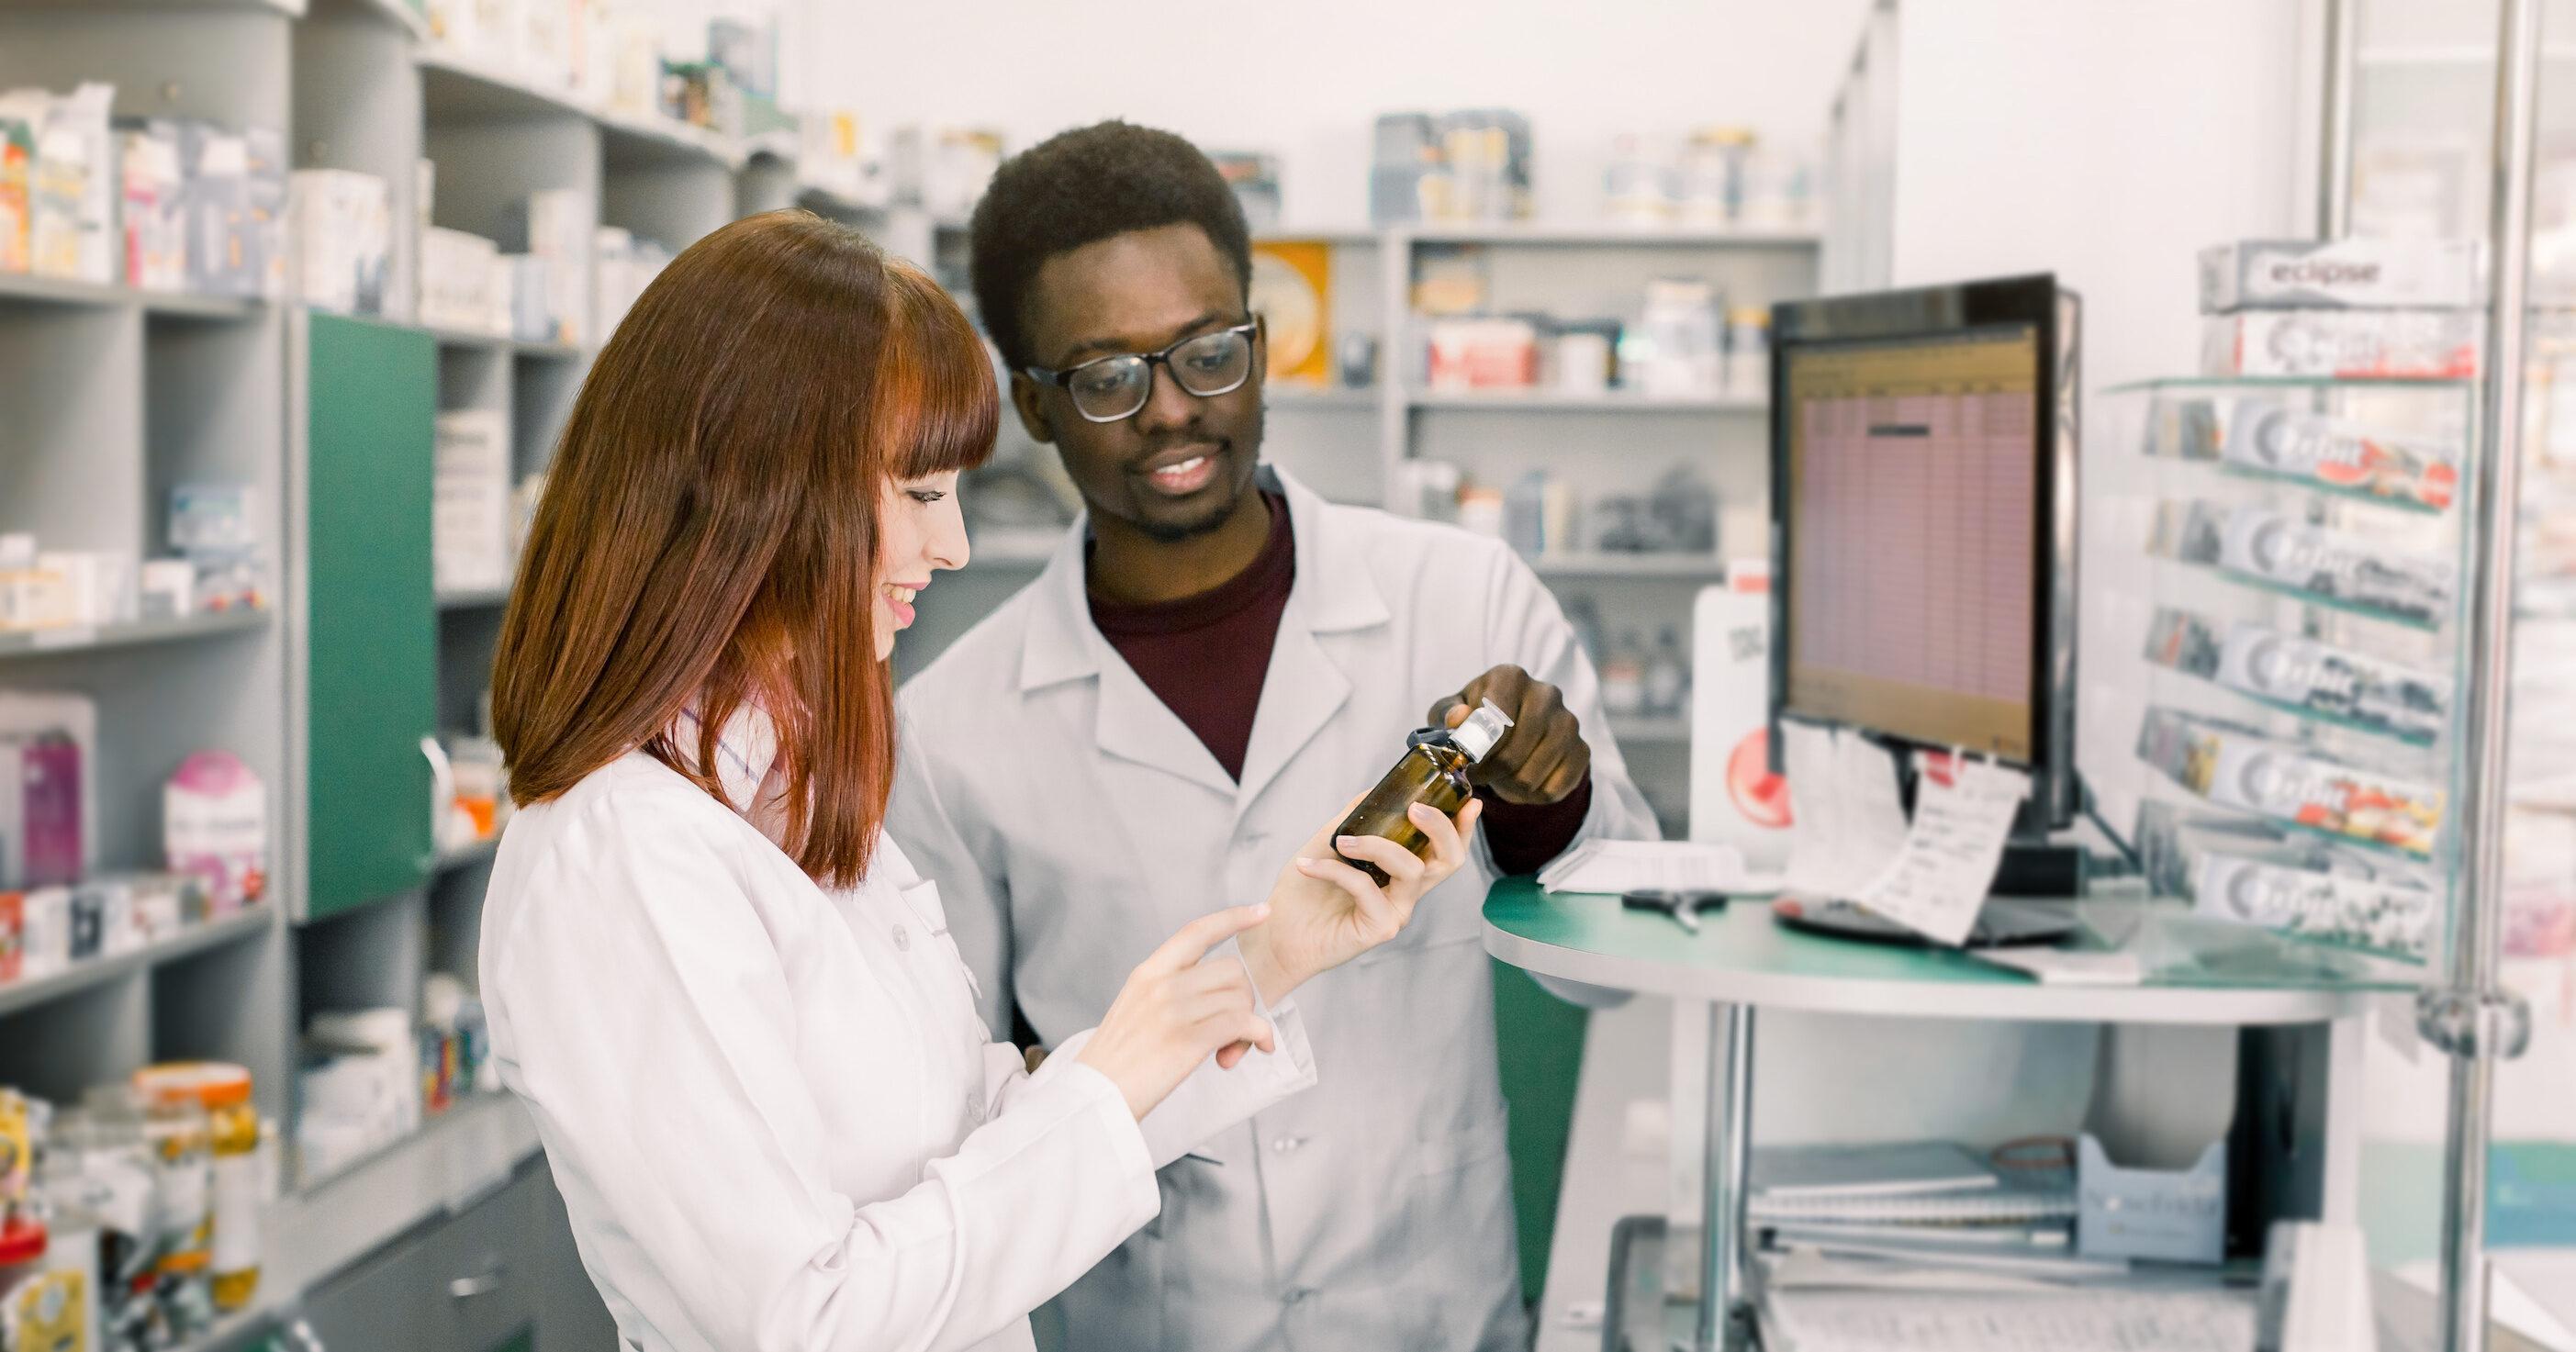 Pharmacists discuss medication compliance | Vanguard Communications | Denver